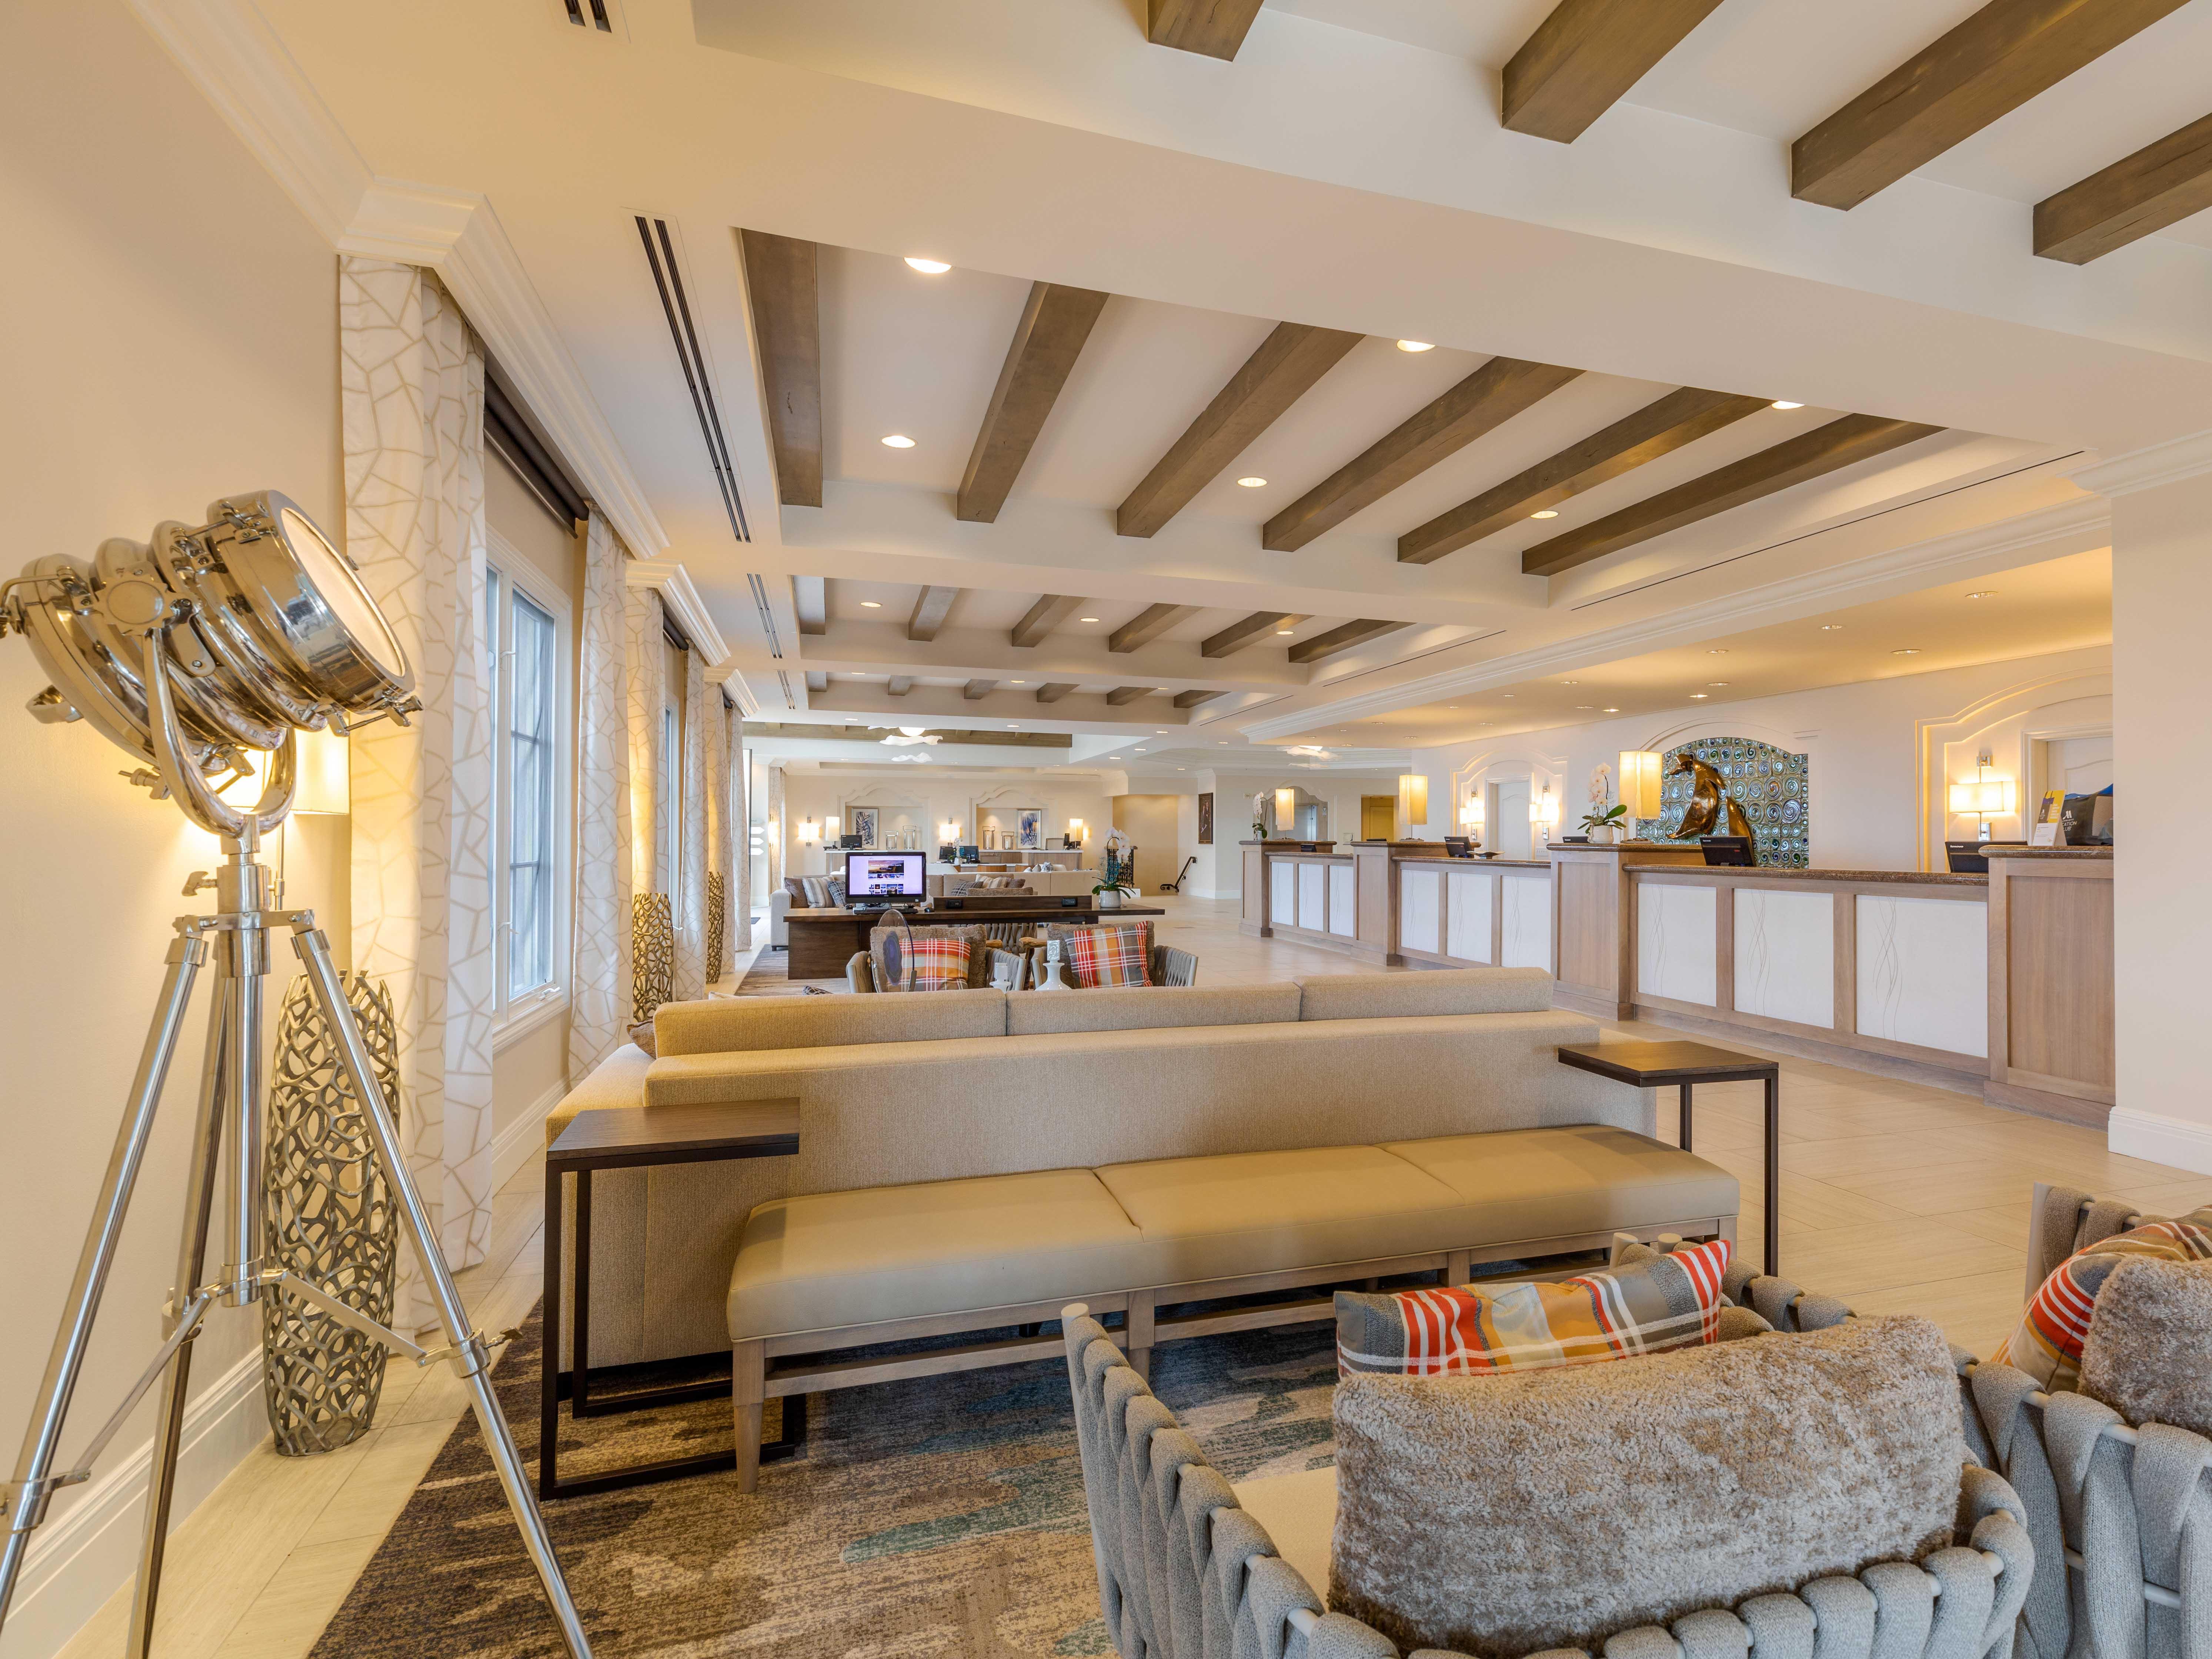 Marriott's Newport Coast<span class='trademark'>®</span> Villas Front Desk. Marriott's Newport Coast<span class='trademark'>®</span> Villas is located in Newport Coast, California United States.